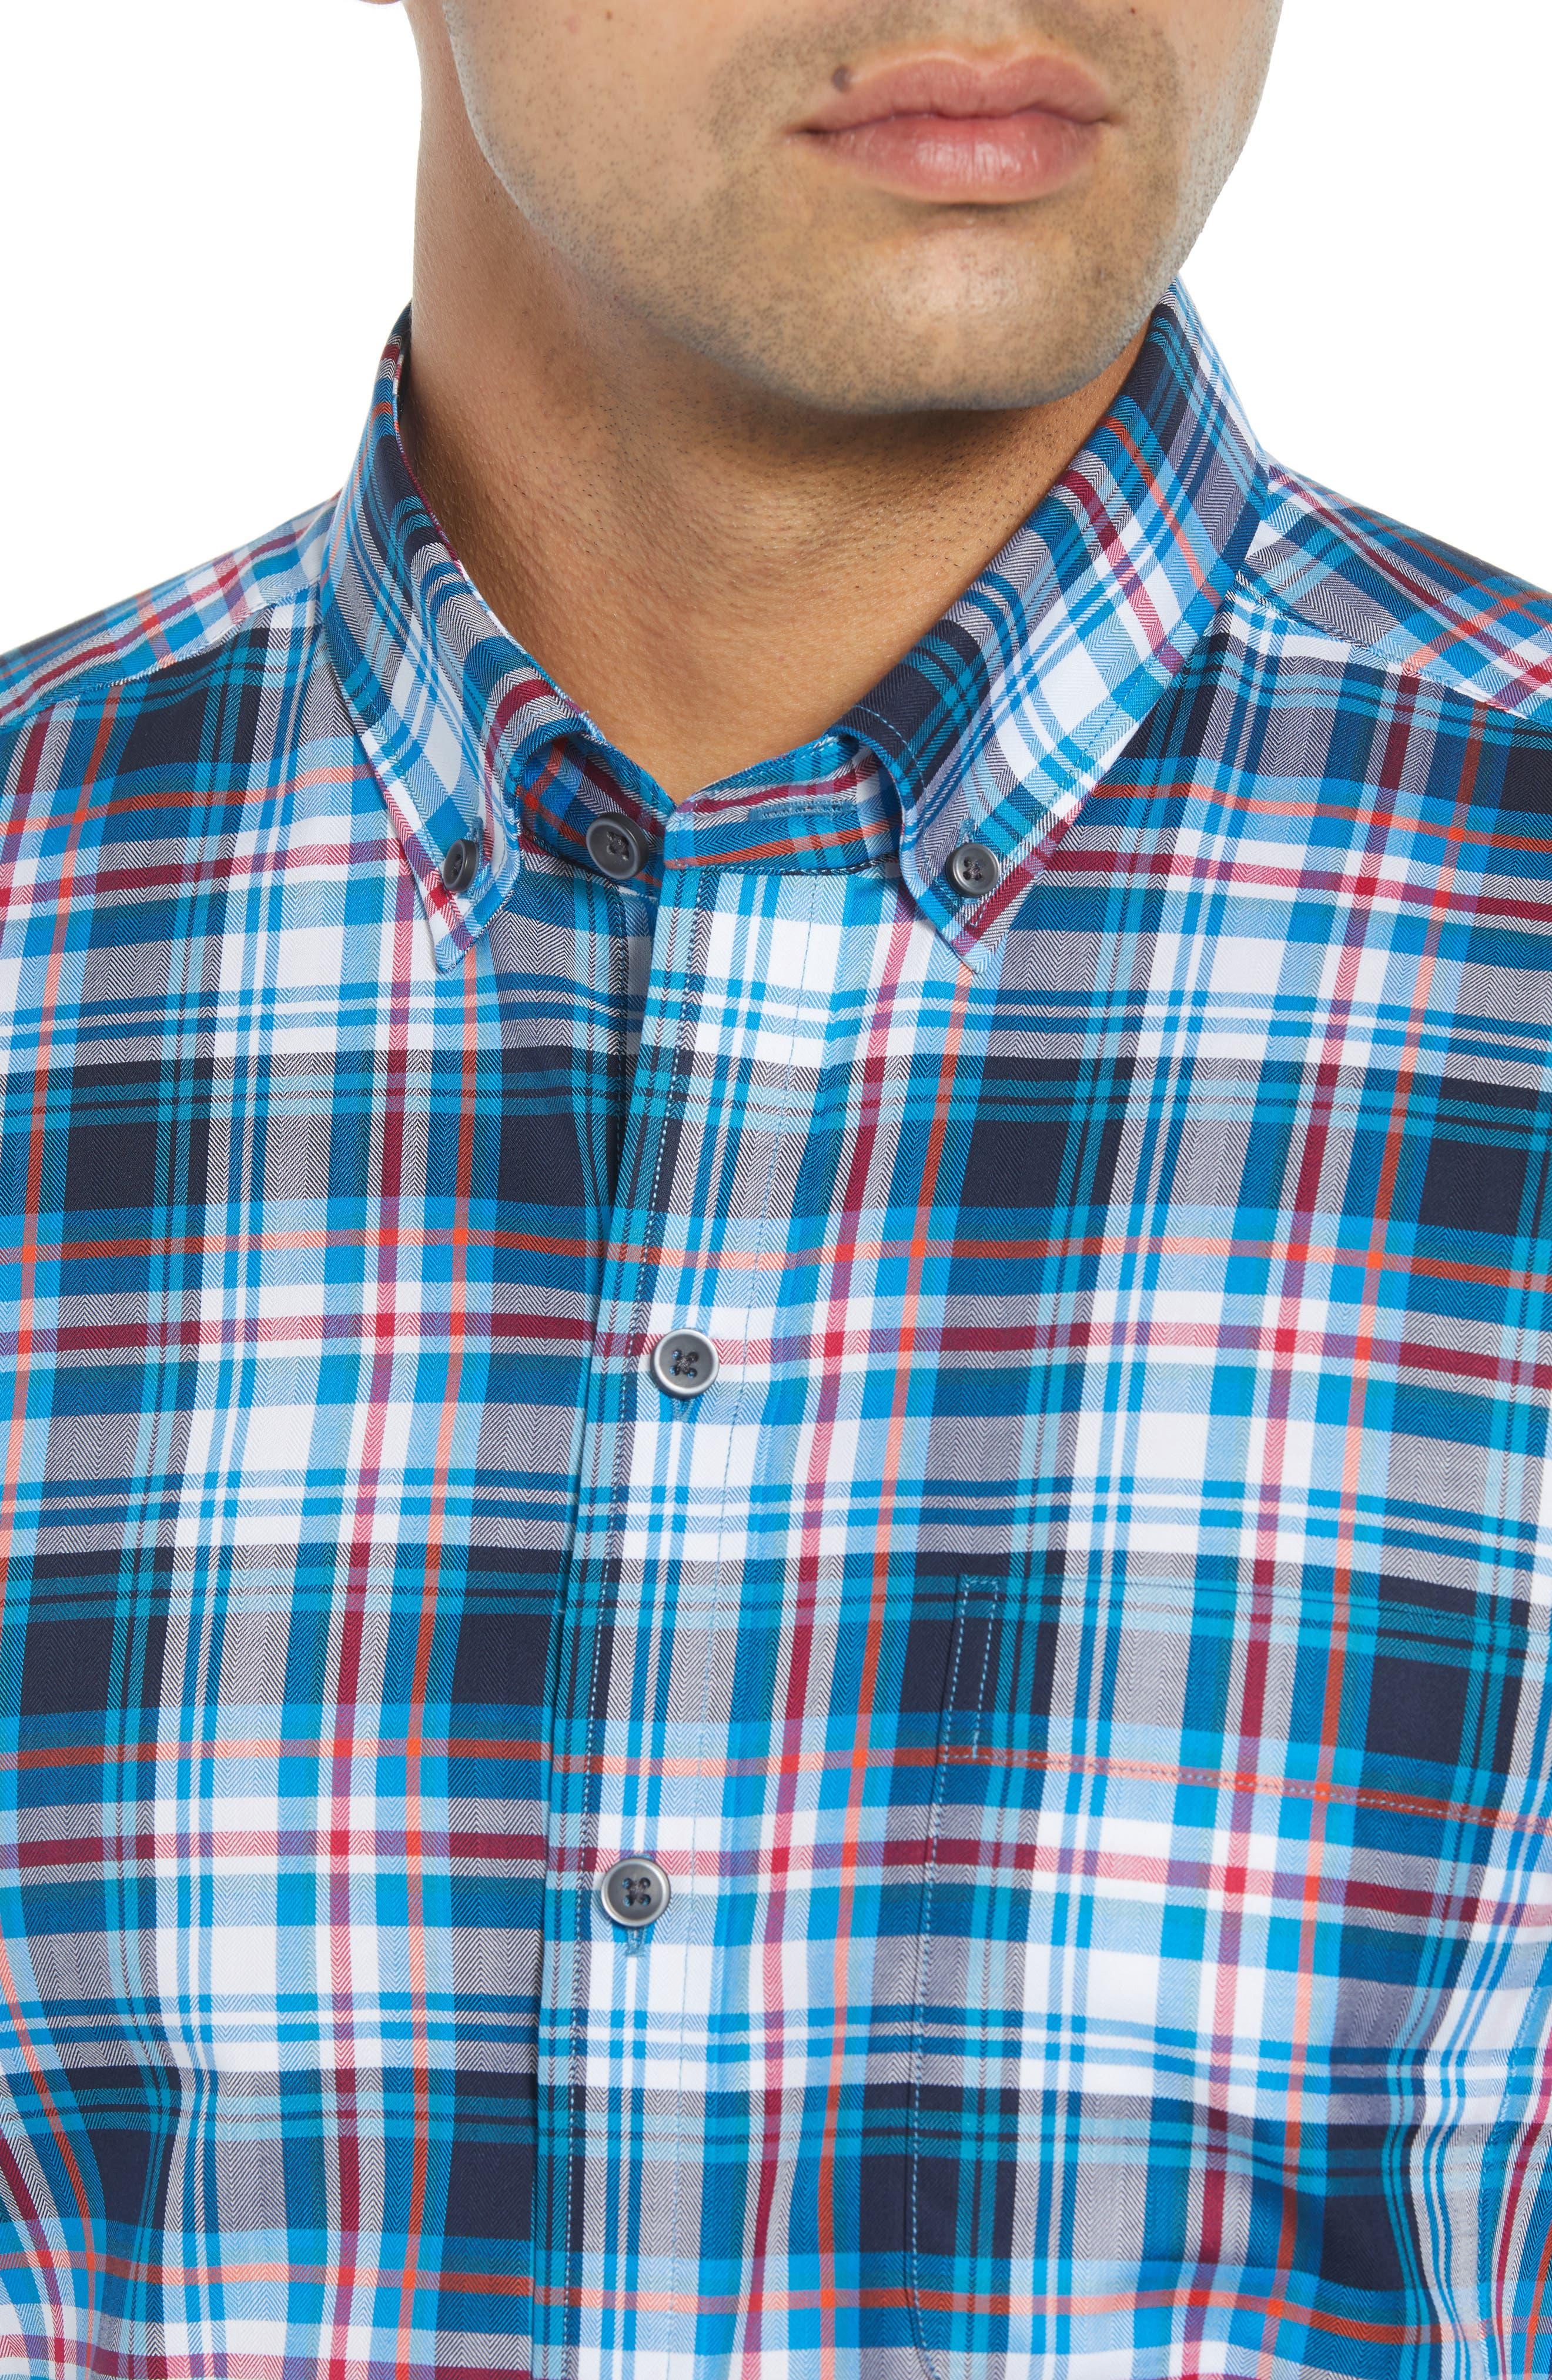 Brad Regular Fit Non-Iron Plaid Sport Shirt,                             Alternate thumbnail 2, color,                             LIBERTY NAVY